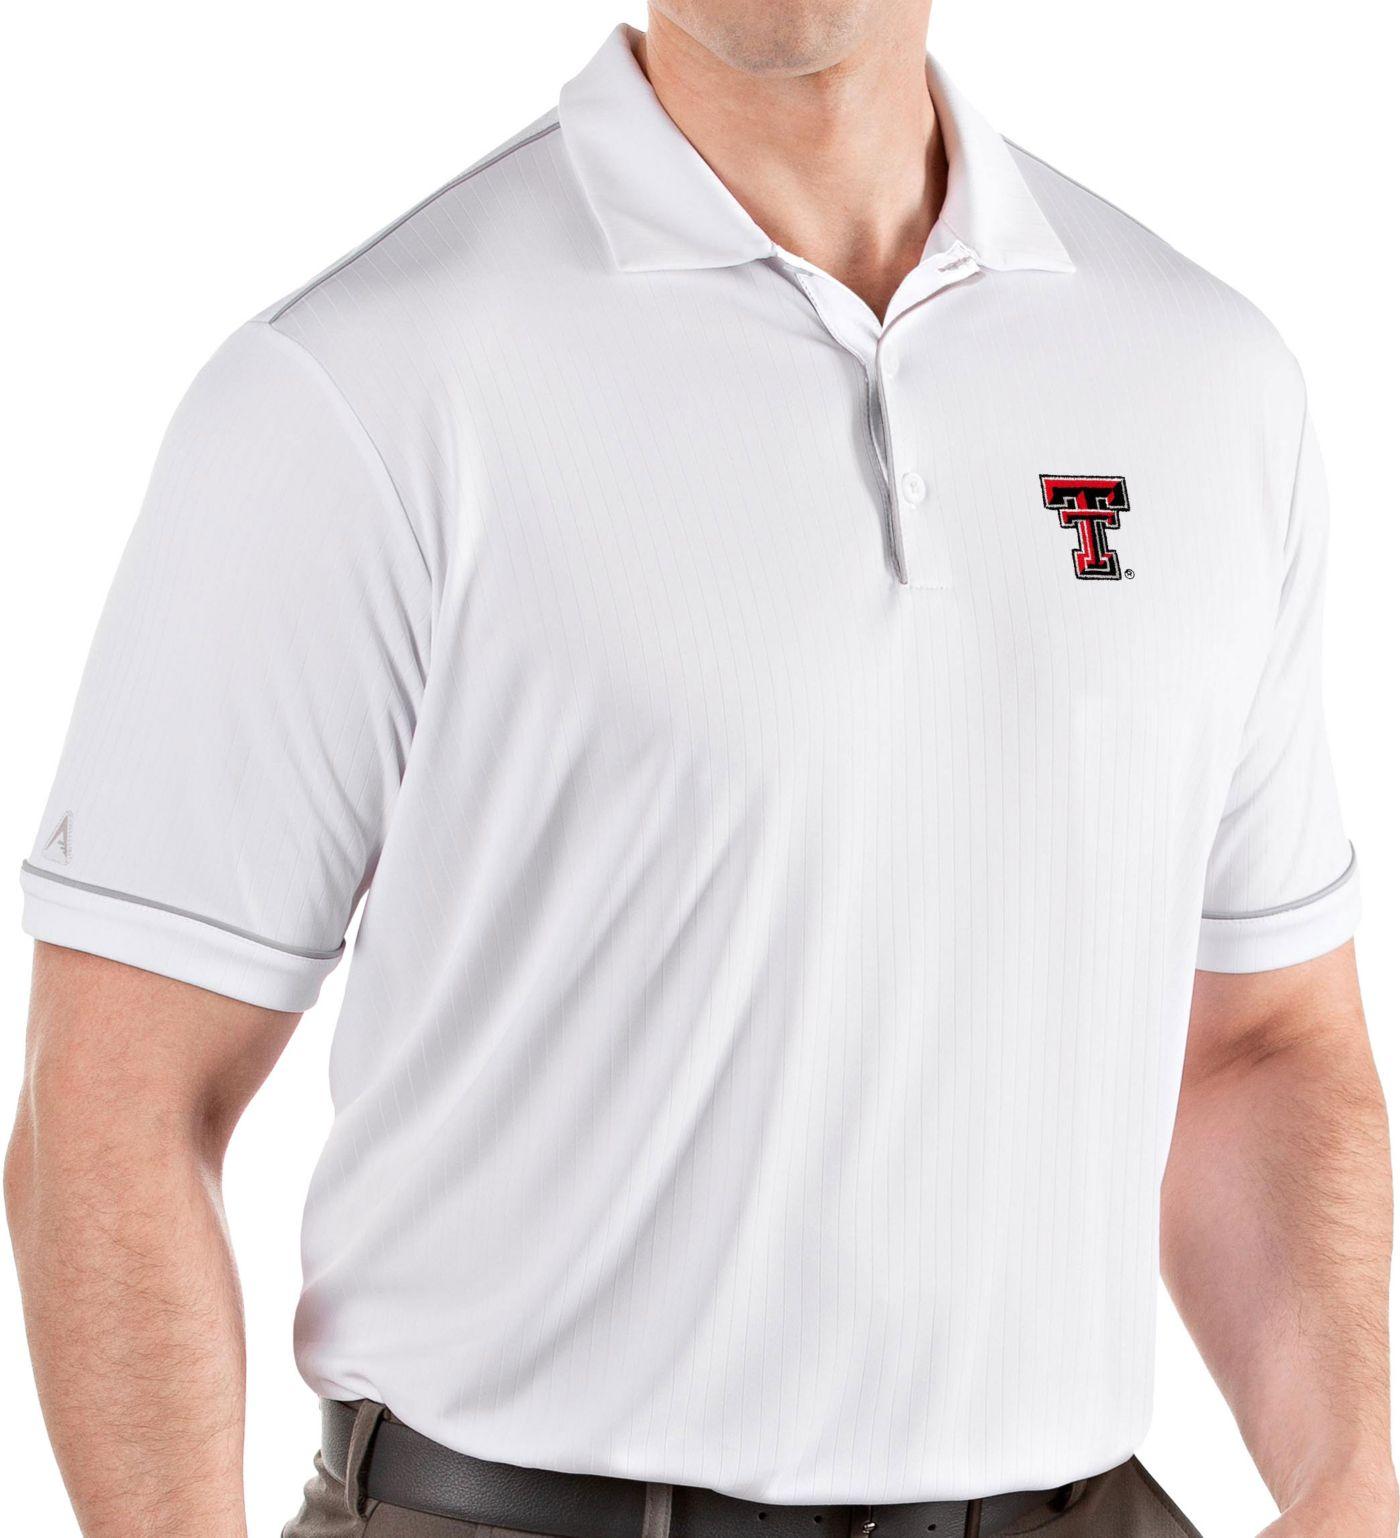 Antigua Men's Texas Tech Red Raiders Salute Performance White Polo